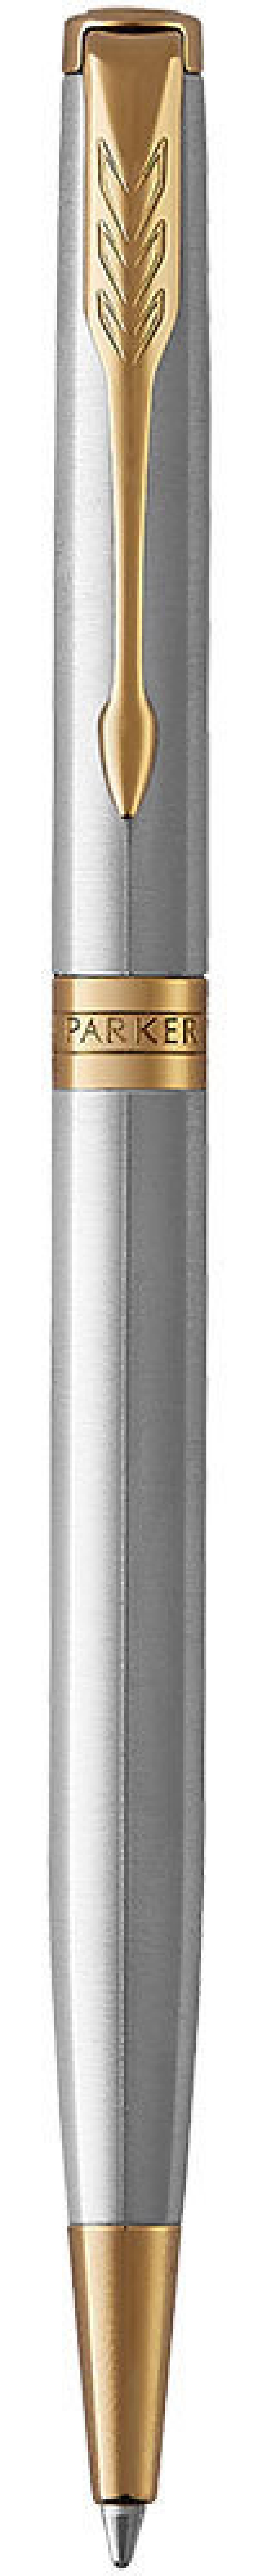 Шариковая ручка поворотная Parker Sonnet Core K427 Slim Stainless Steel GT черный M 1931508 шариковая ручка поворотная parker sonnet core k527 stainless steel gt черный m 1931507